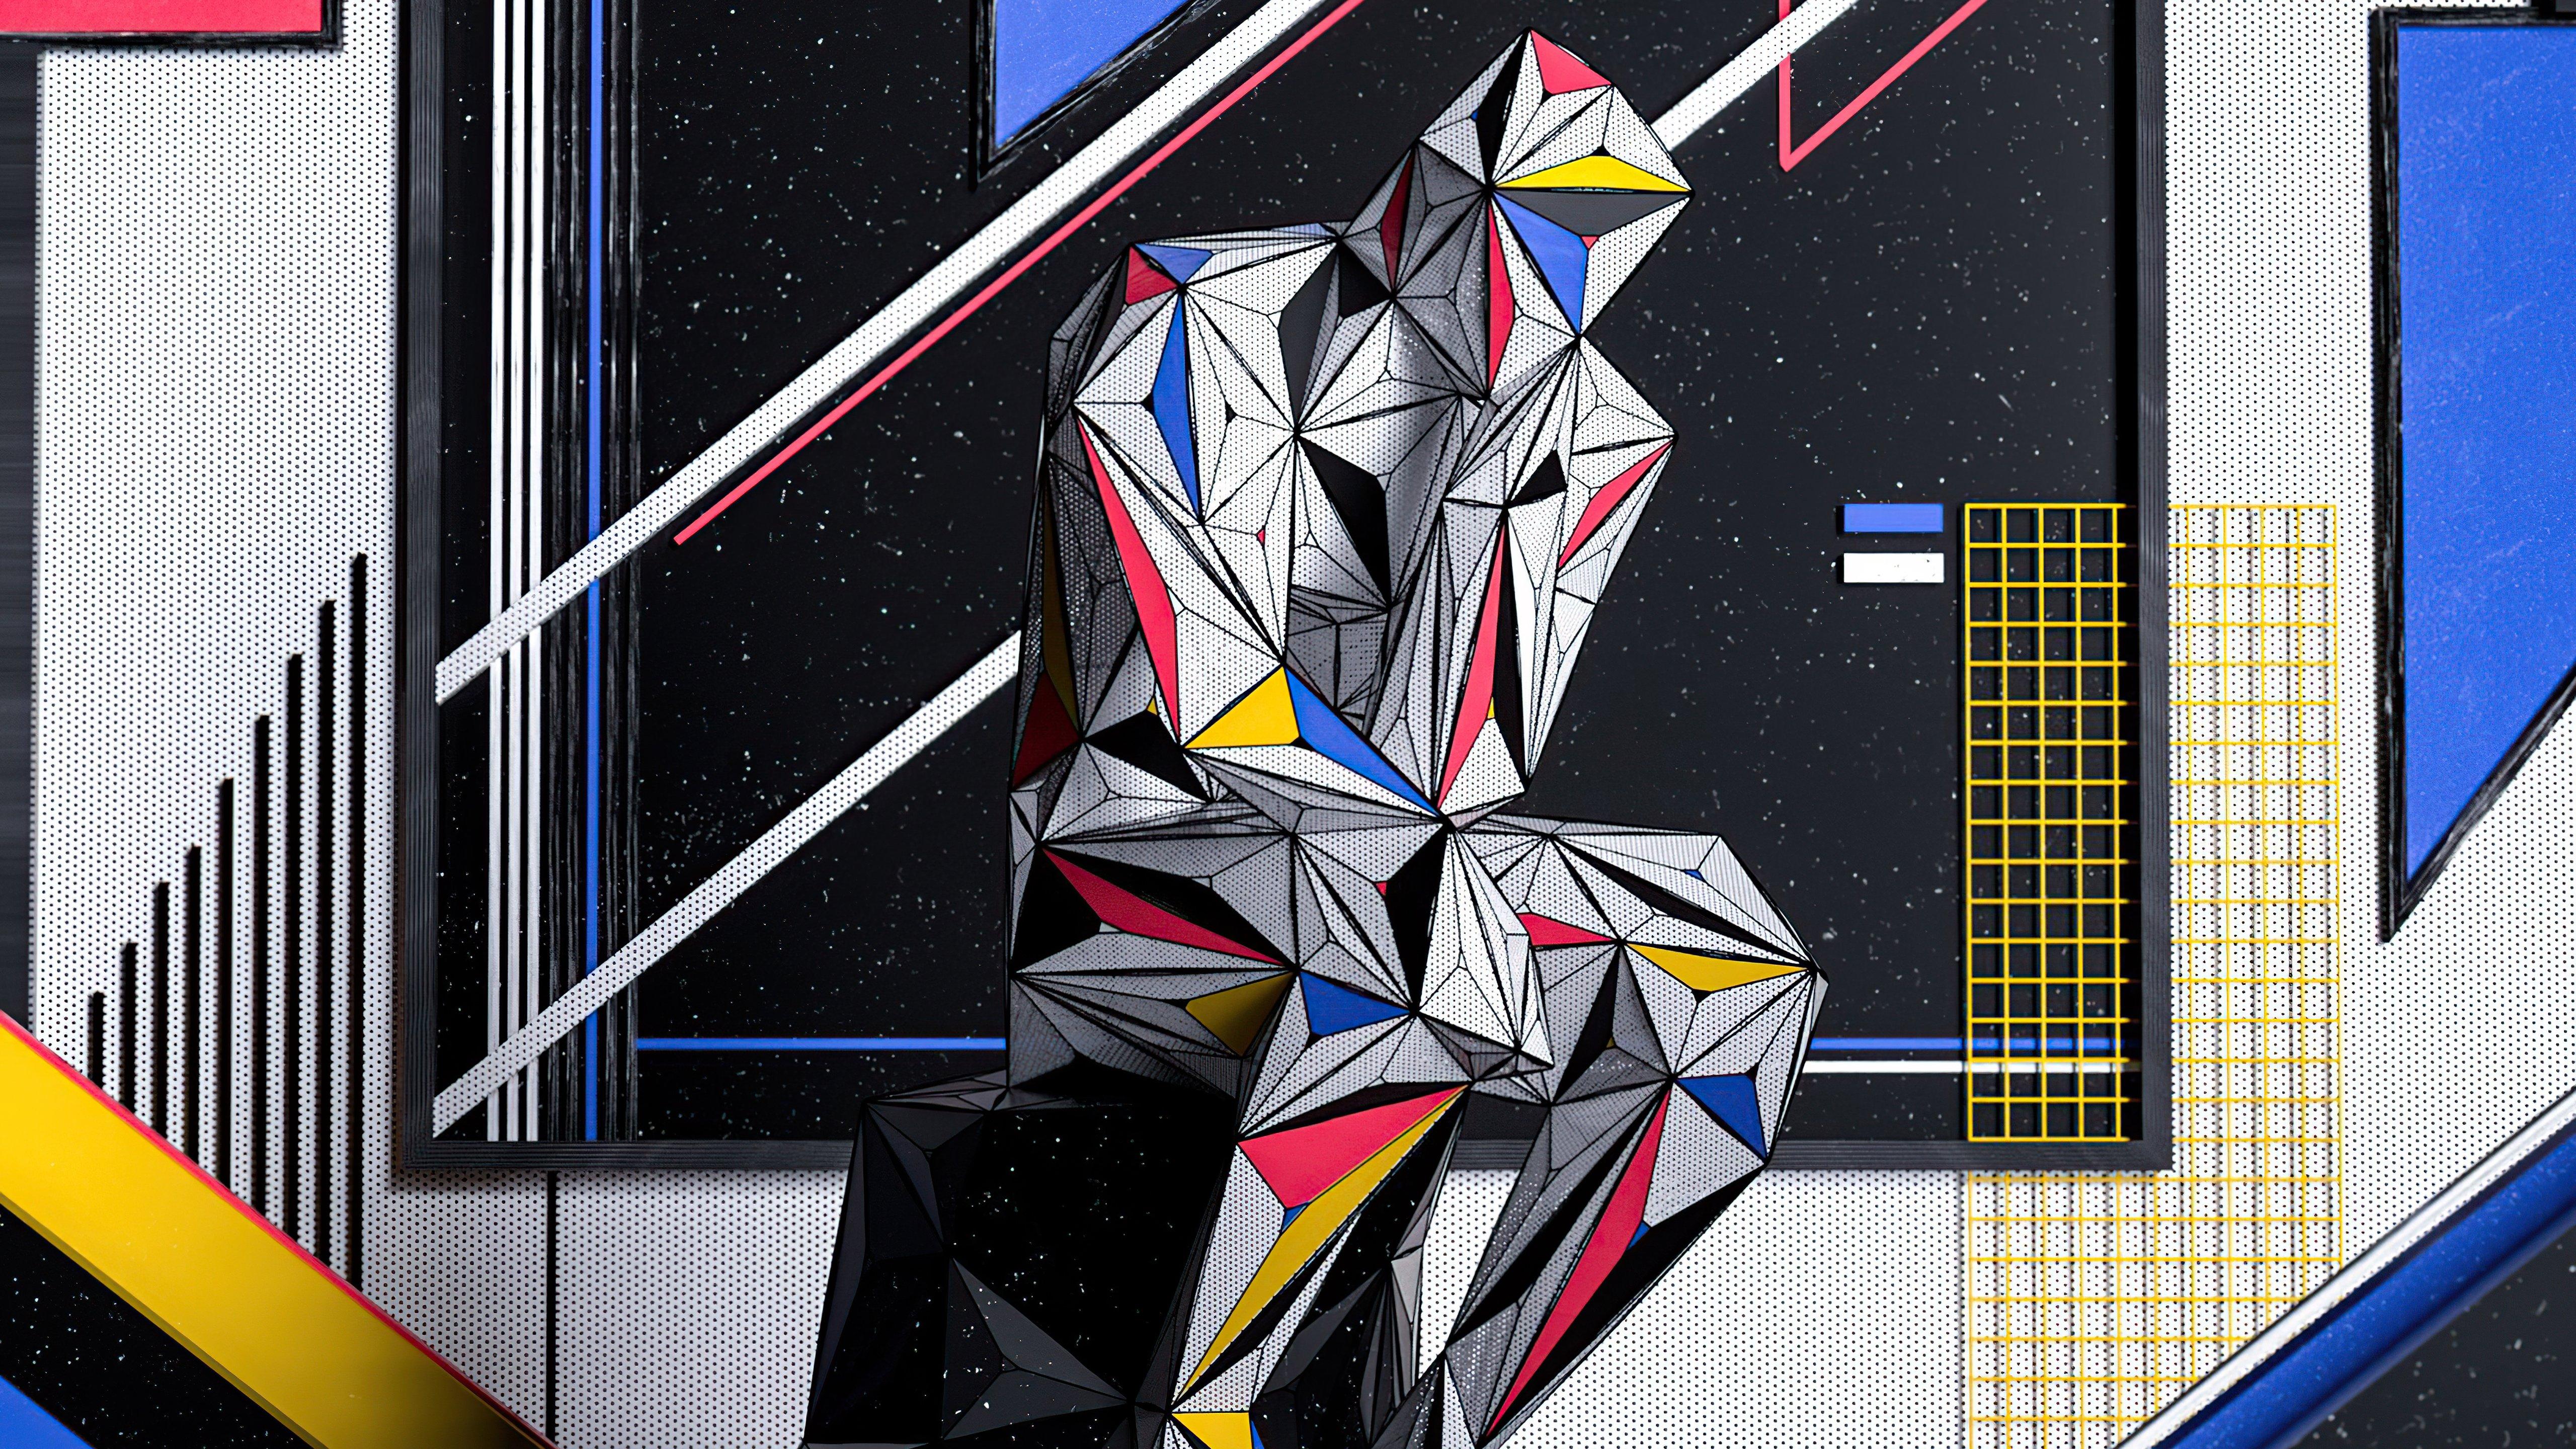 Wallpaper Man thinking as Piet Mondrian painting